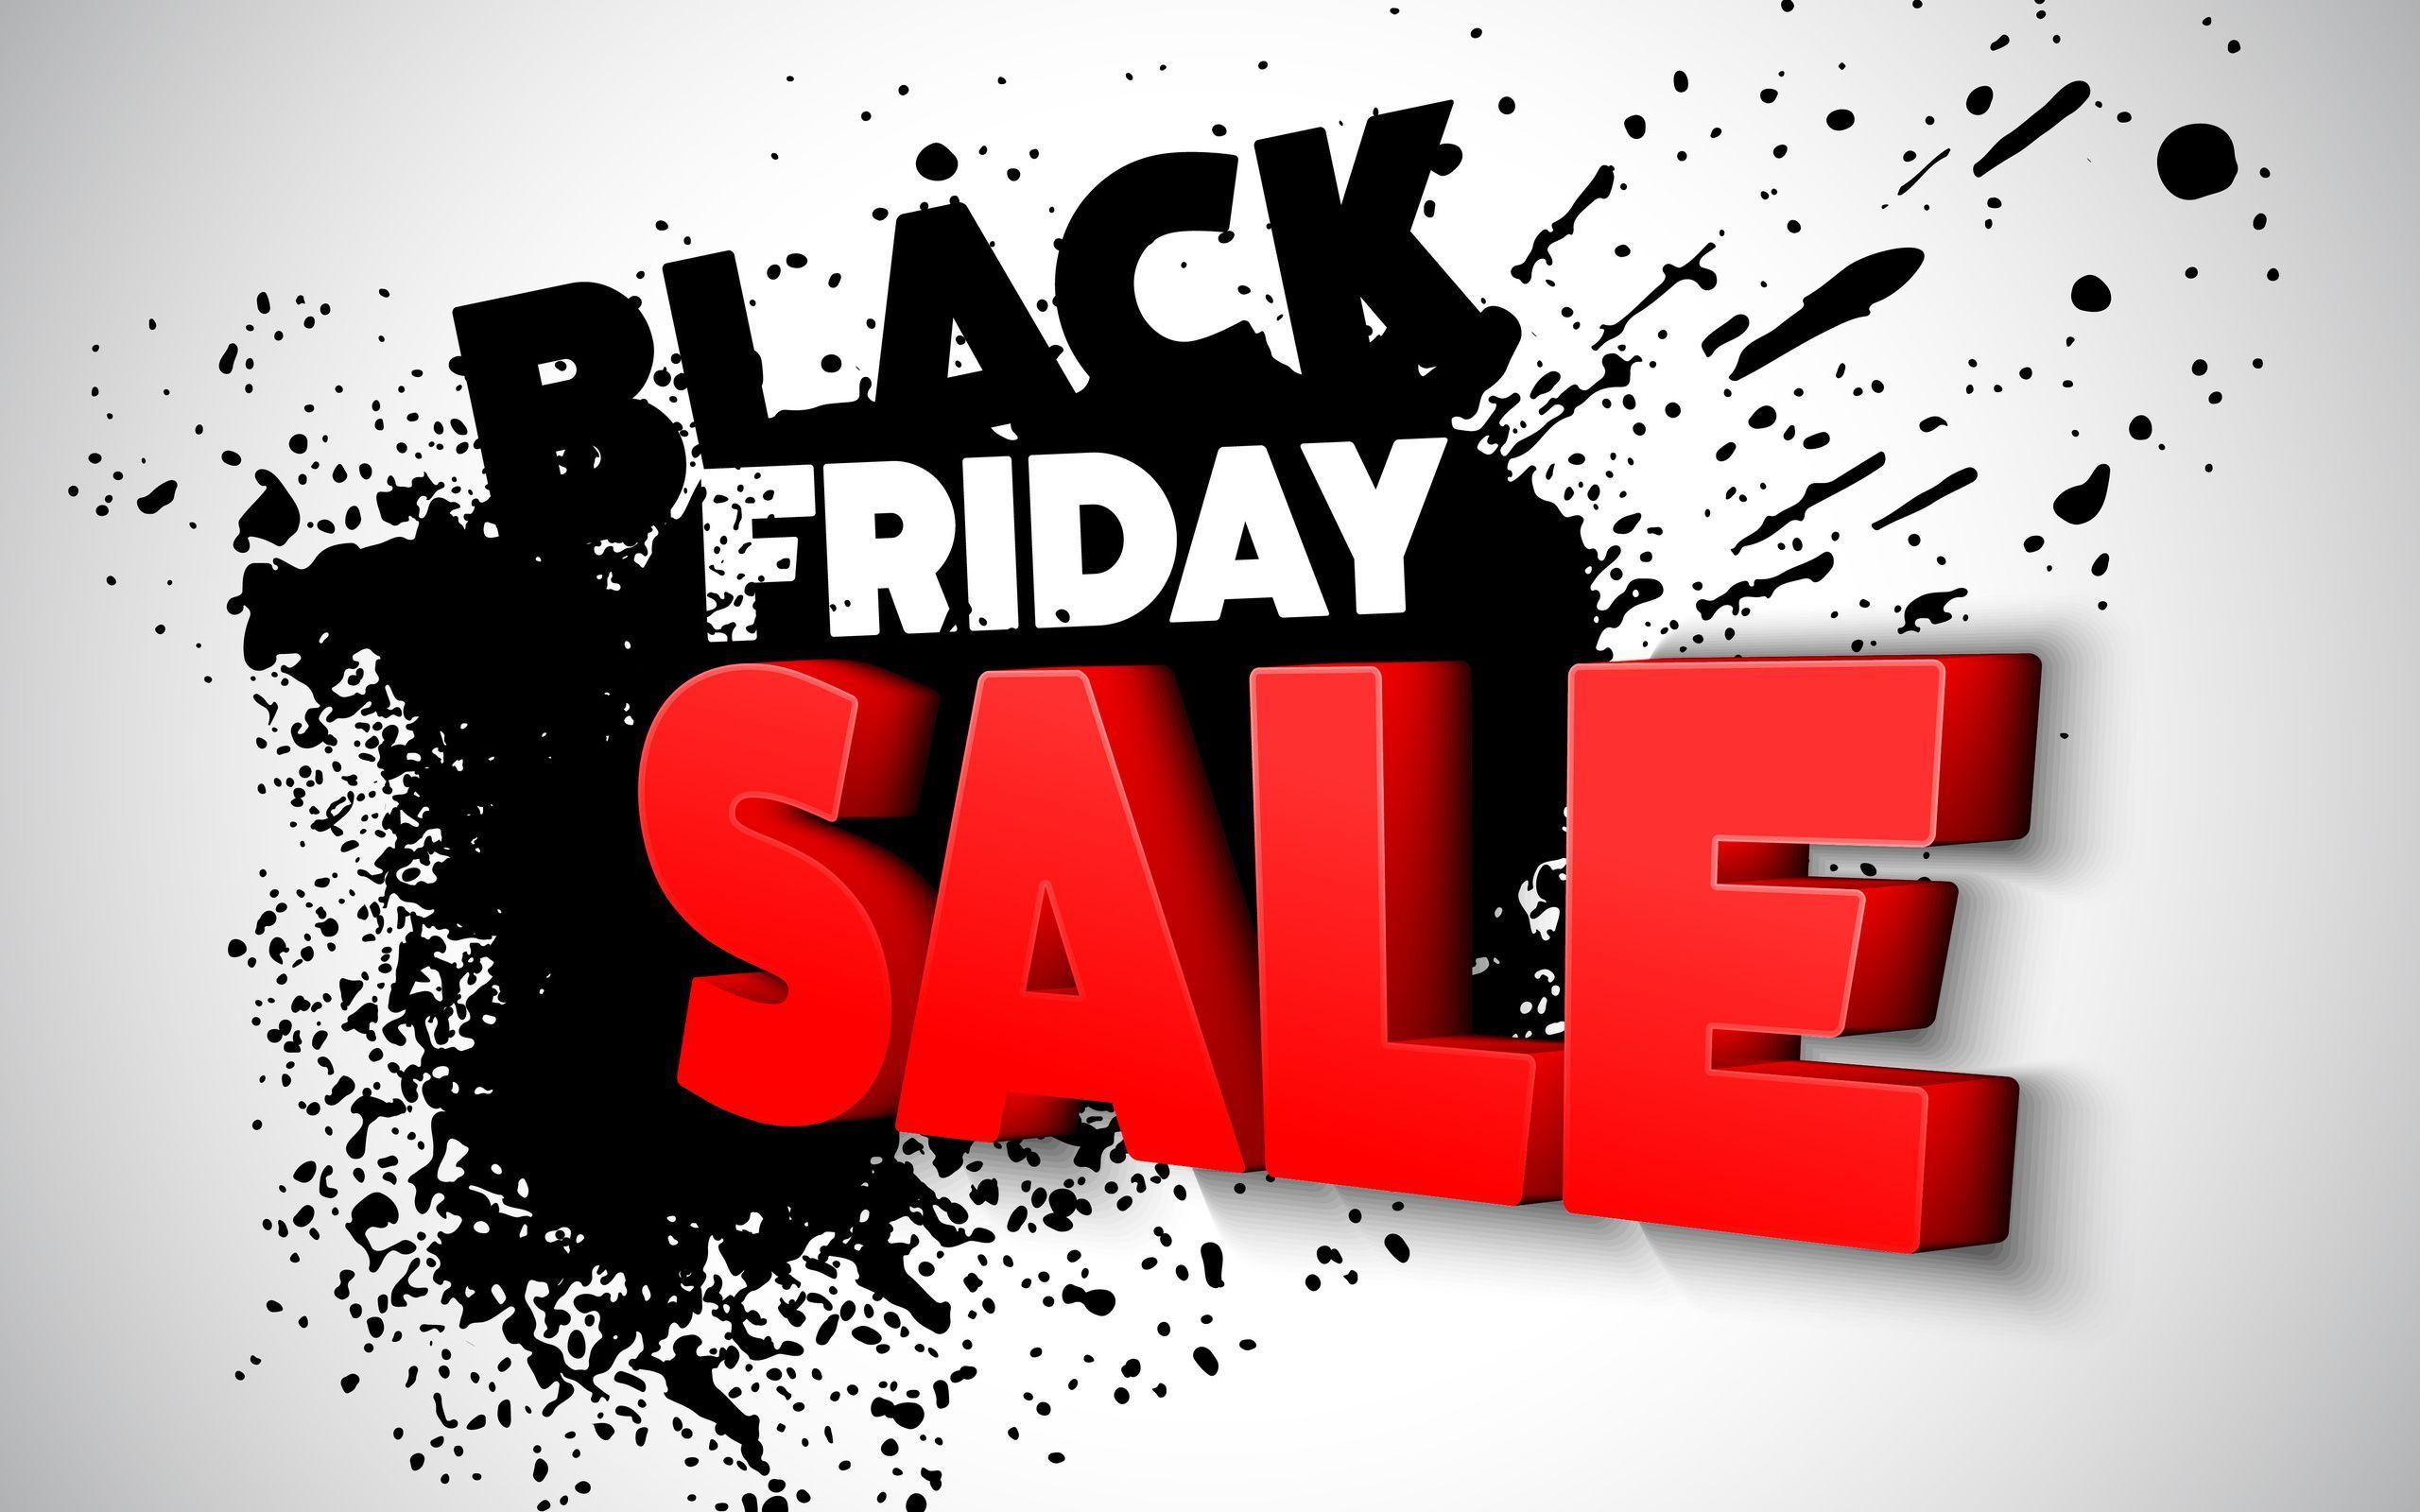 Black Friday Wallpaper 5   King Tumblr 2560x1600